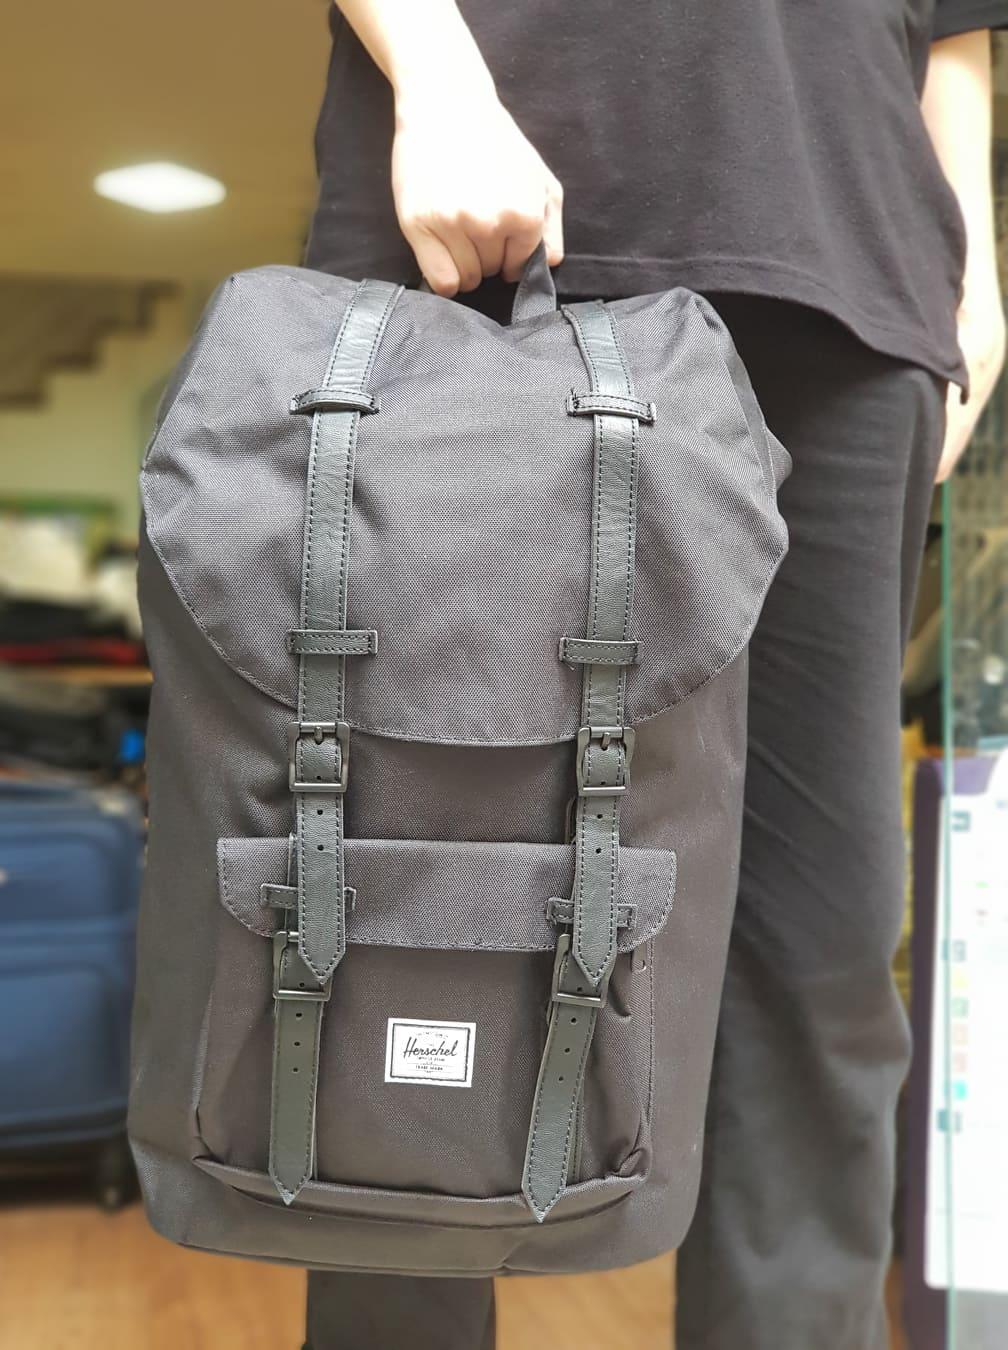 Siêu phẩm balo herschel little america backpack gây sốt năm 2020 10